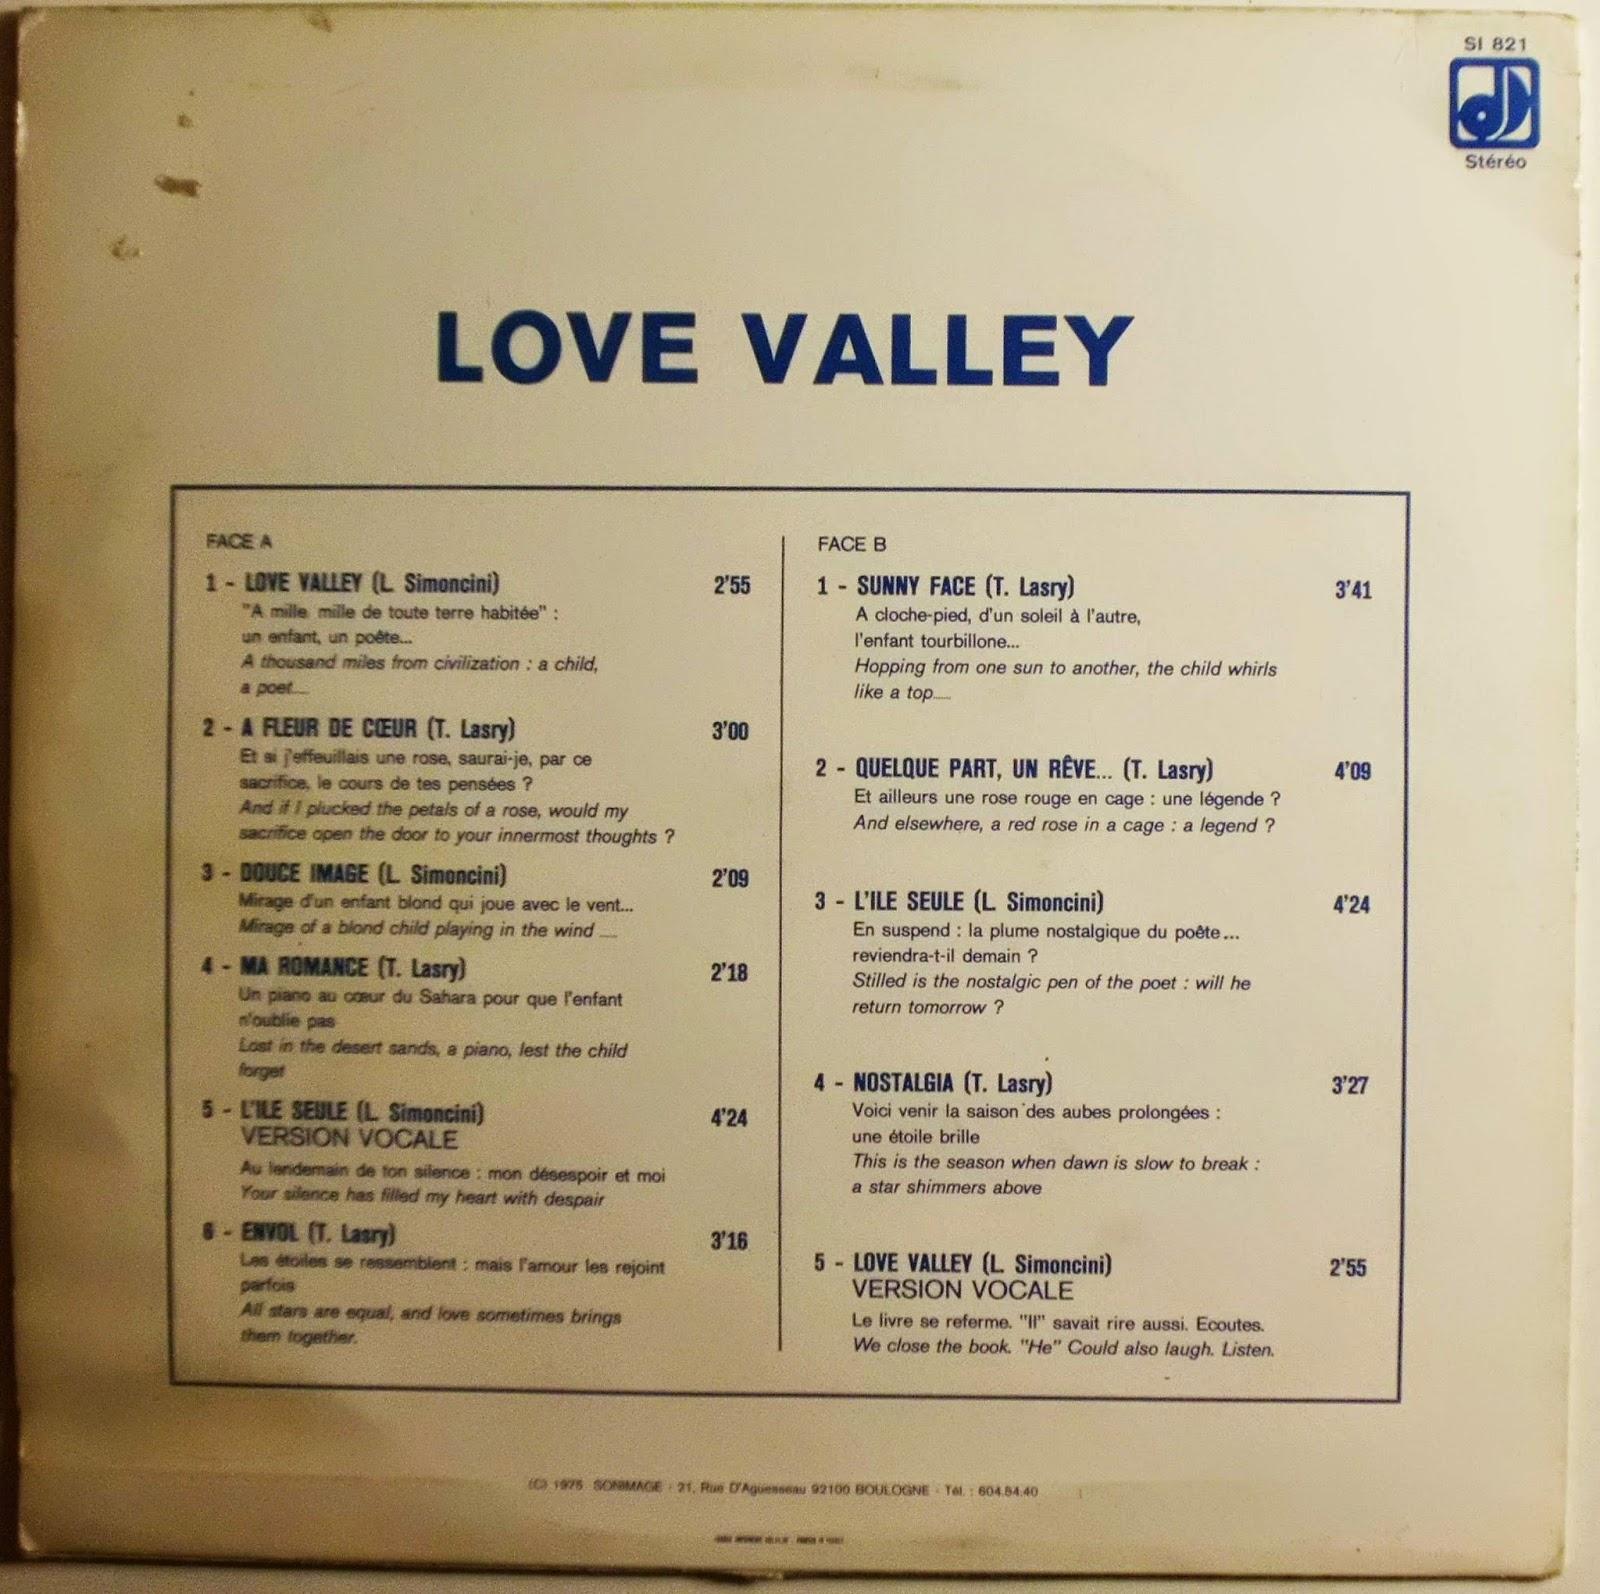 Luciano Simoncini Teddy Lasry Love Valley